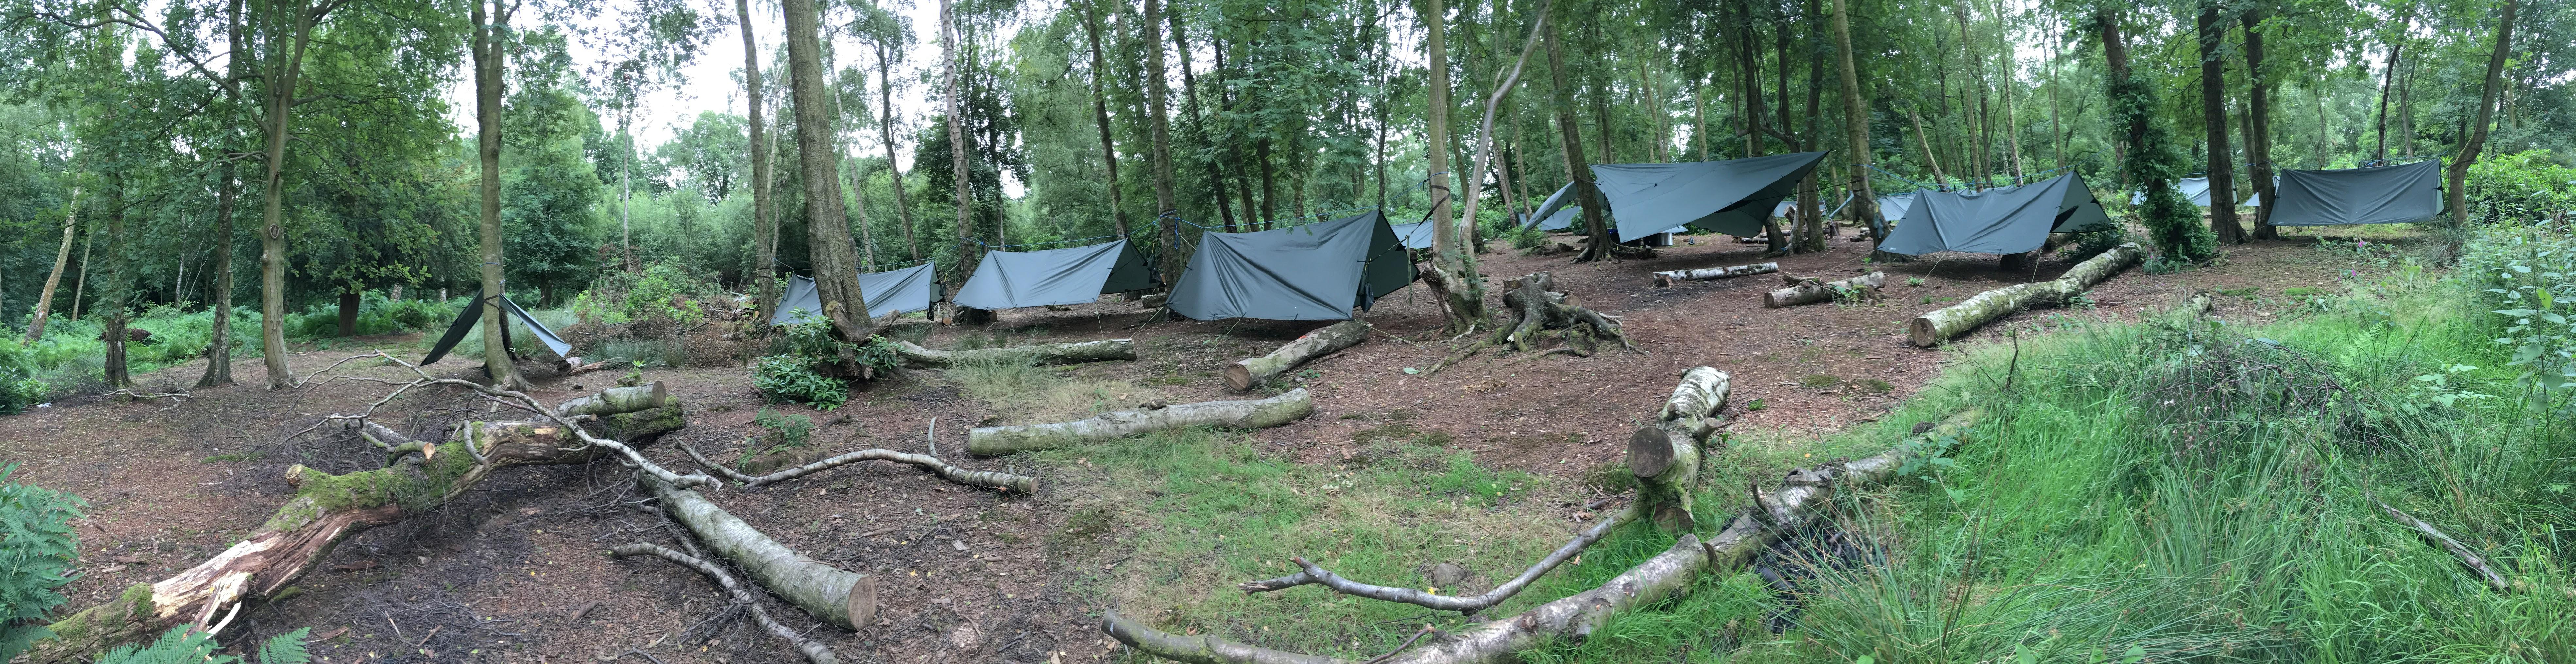 camp site hammock shelter tent